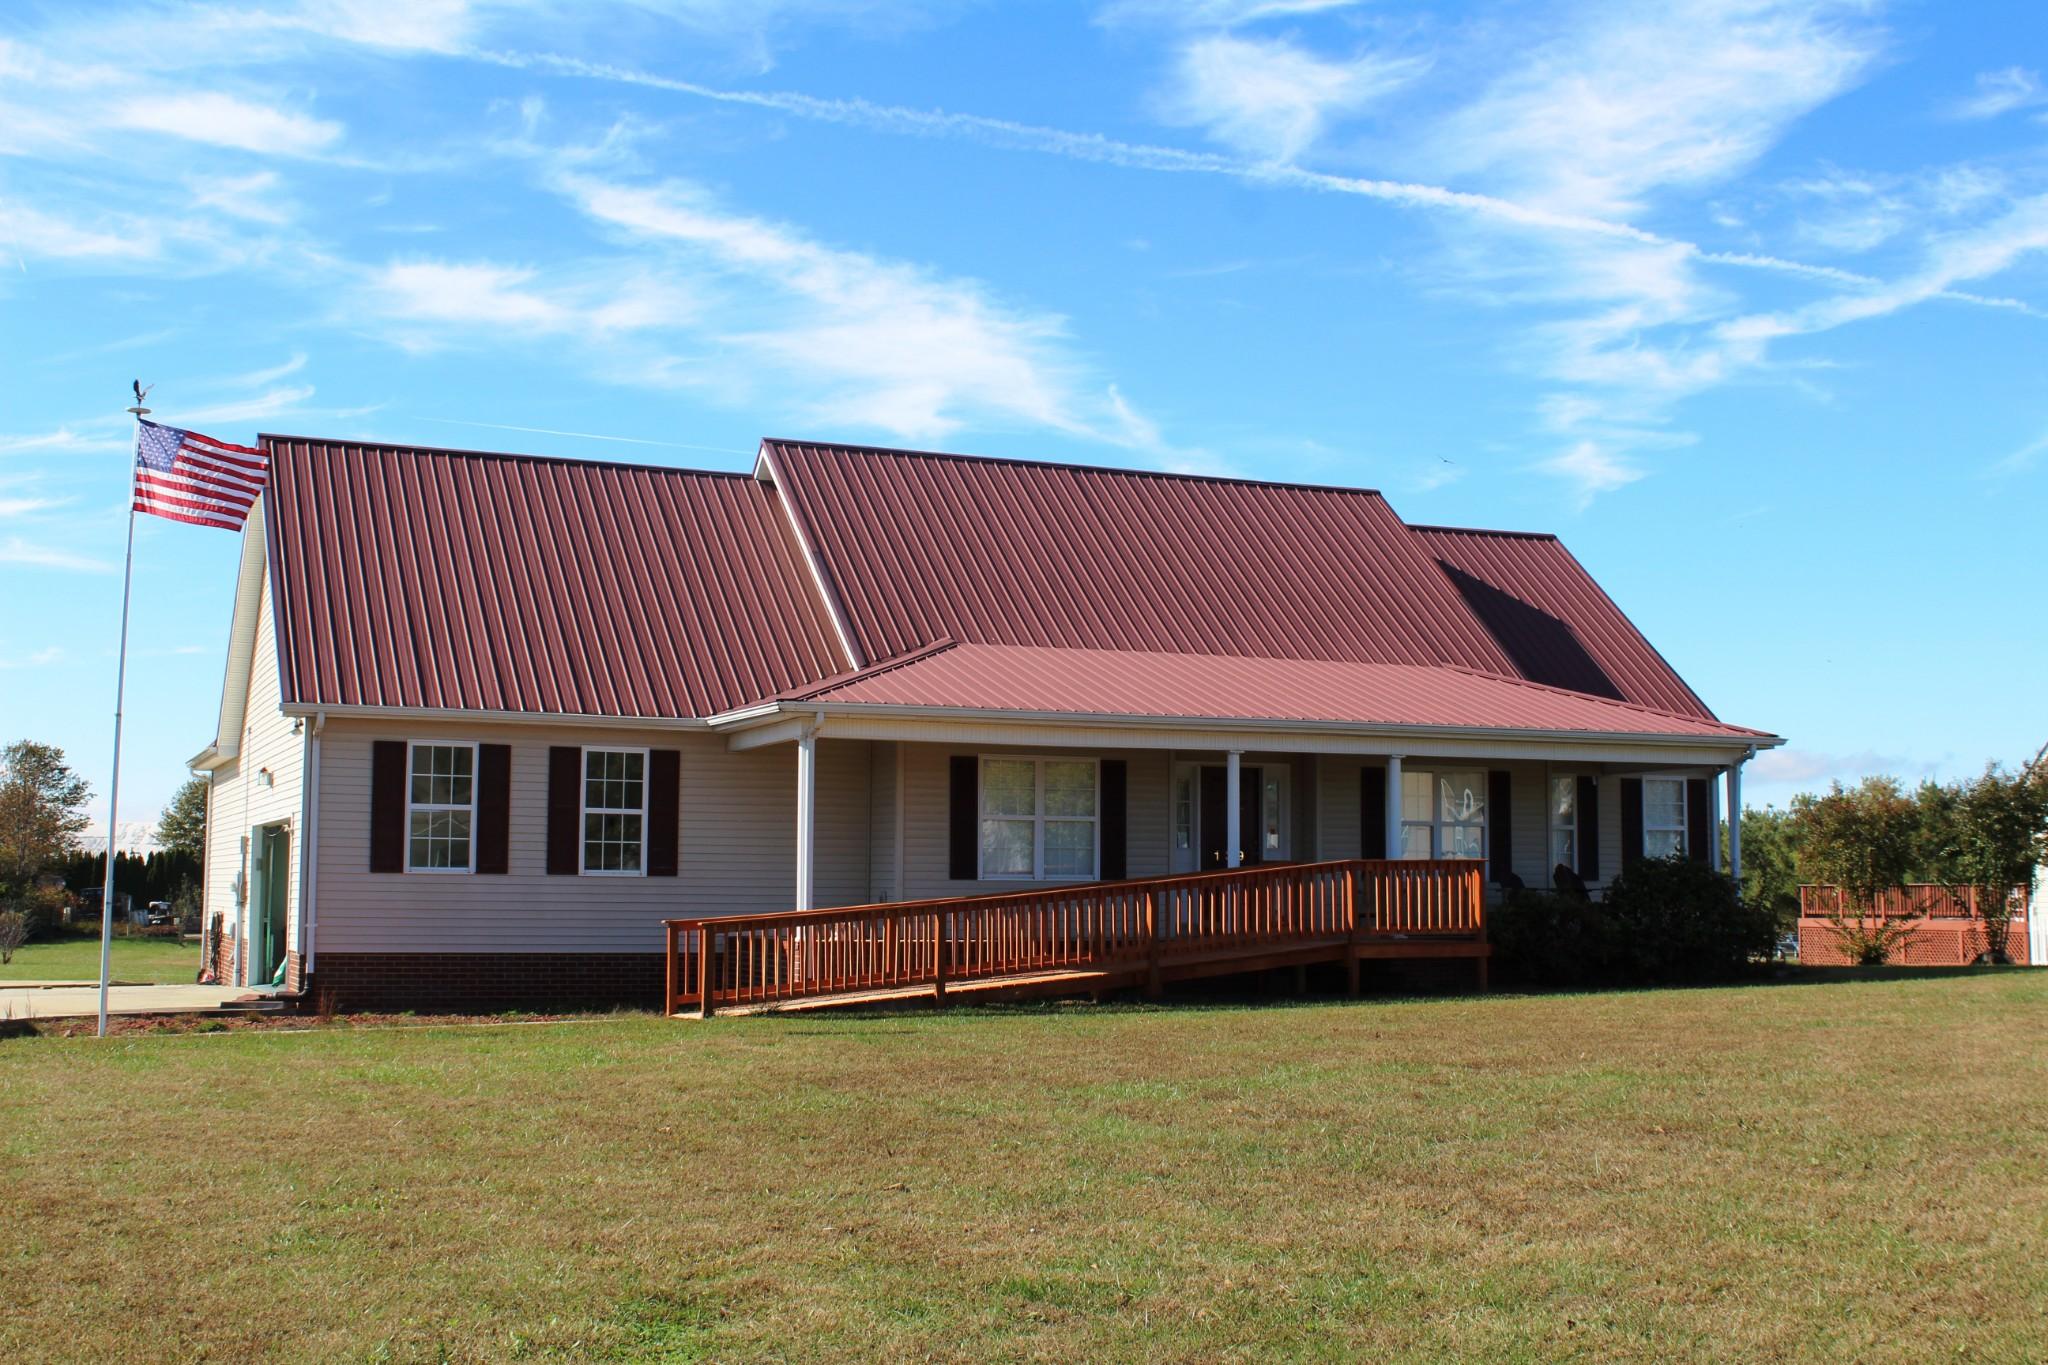 139 Remington Ln, Mc Minnville, TN 37110 - Mc Minnville, TN real estate listing